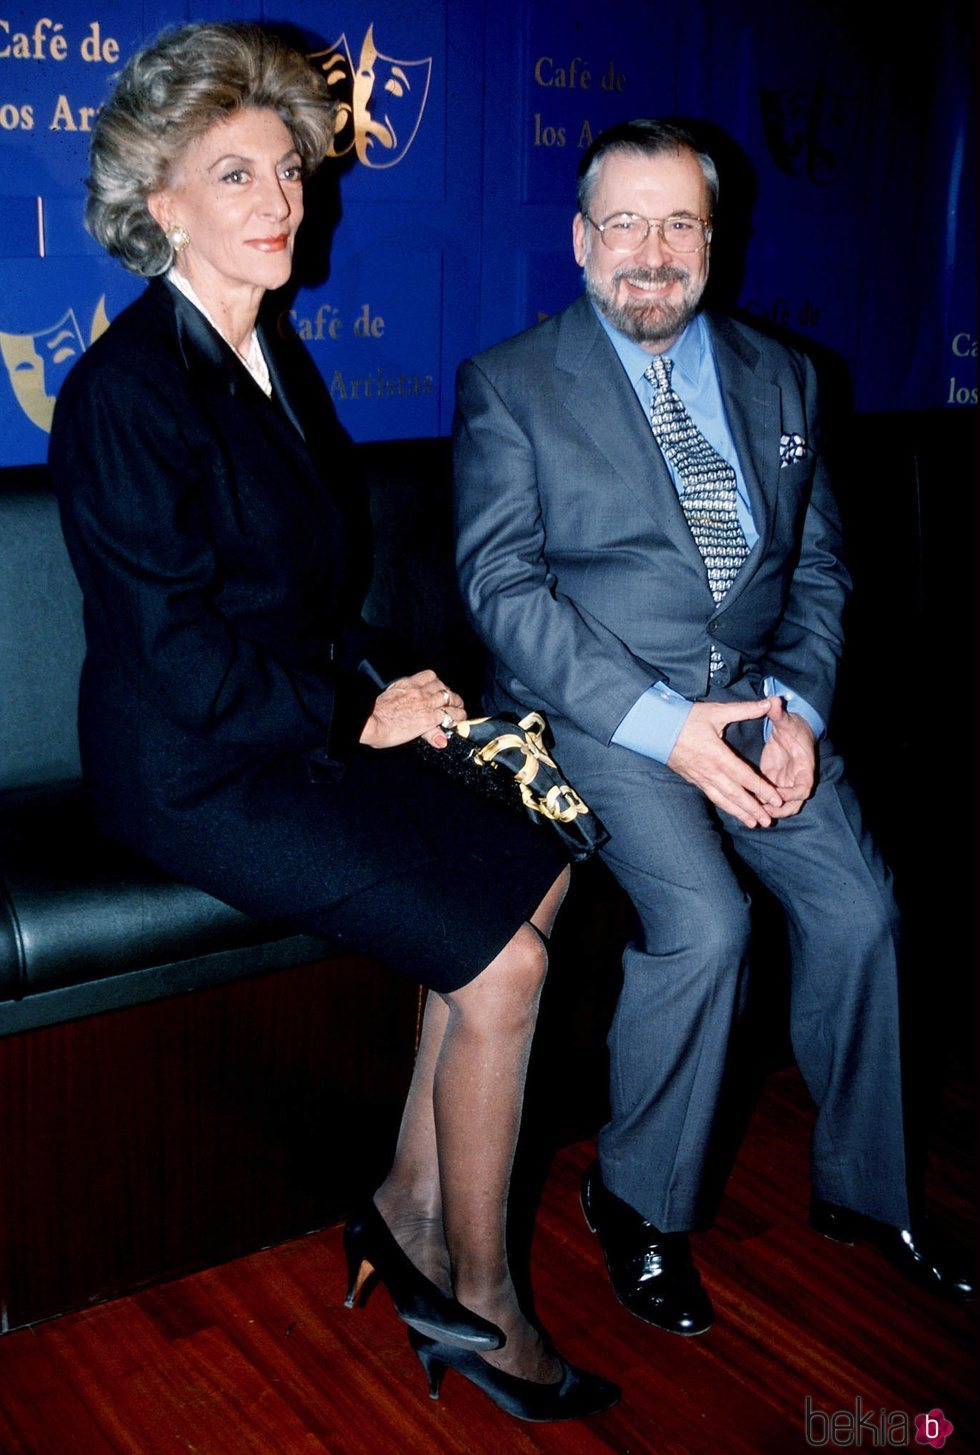 Pitita Ridruejo y Chicho Ibáñez Serrador